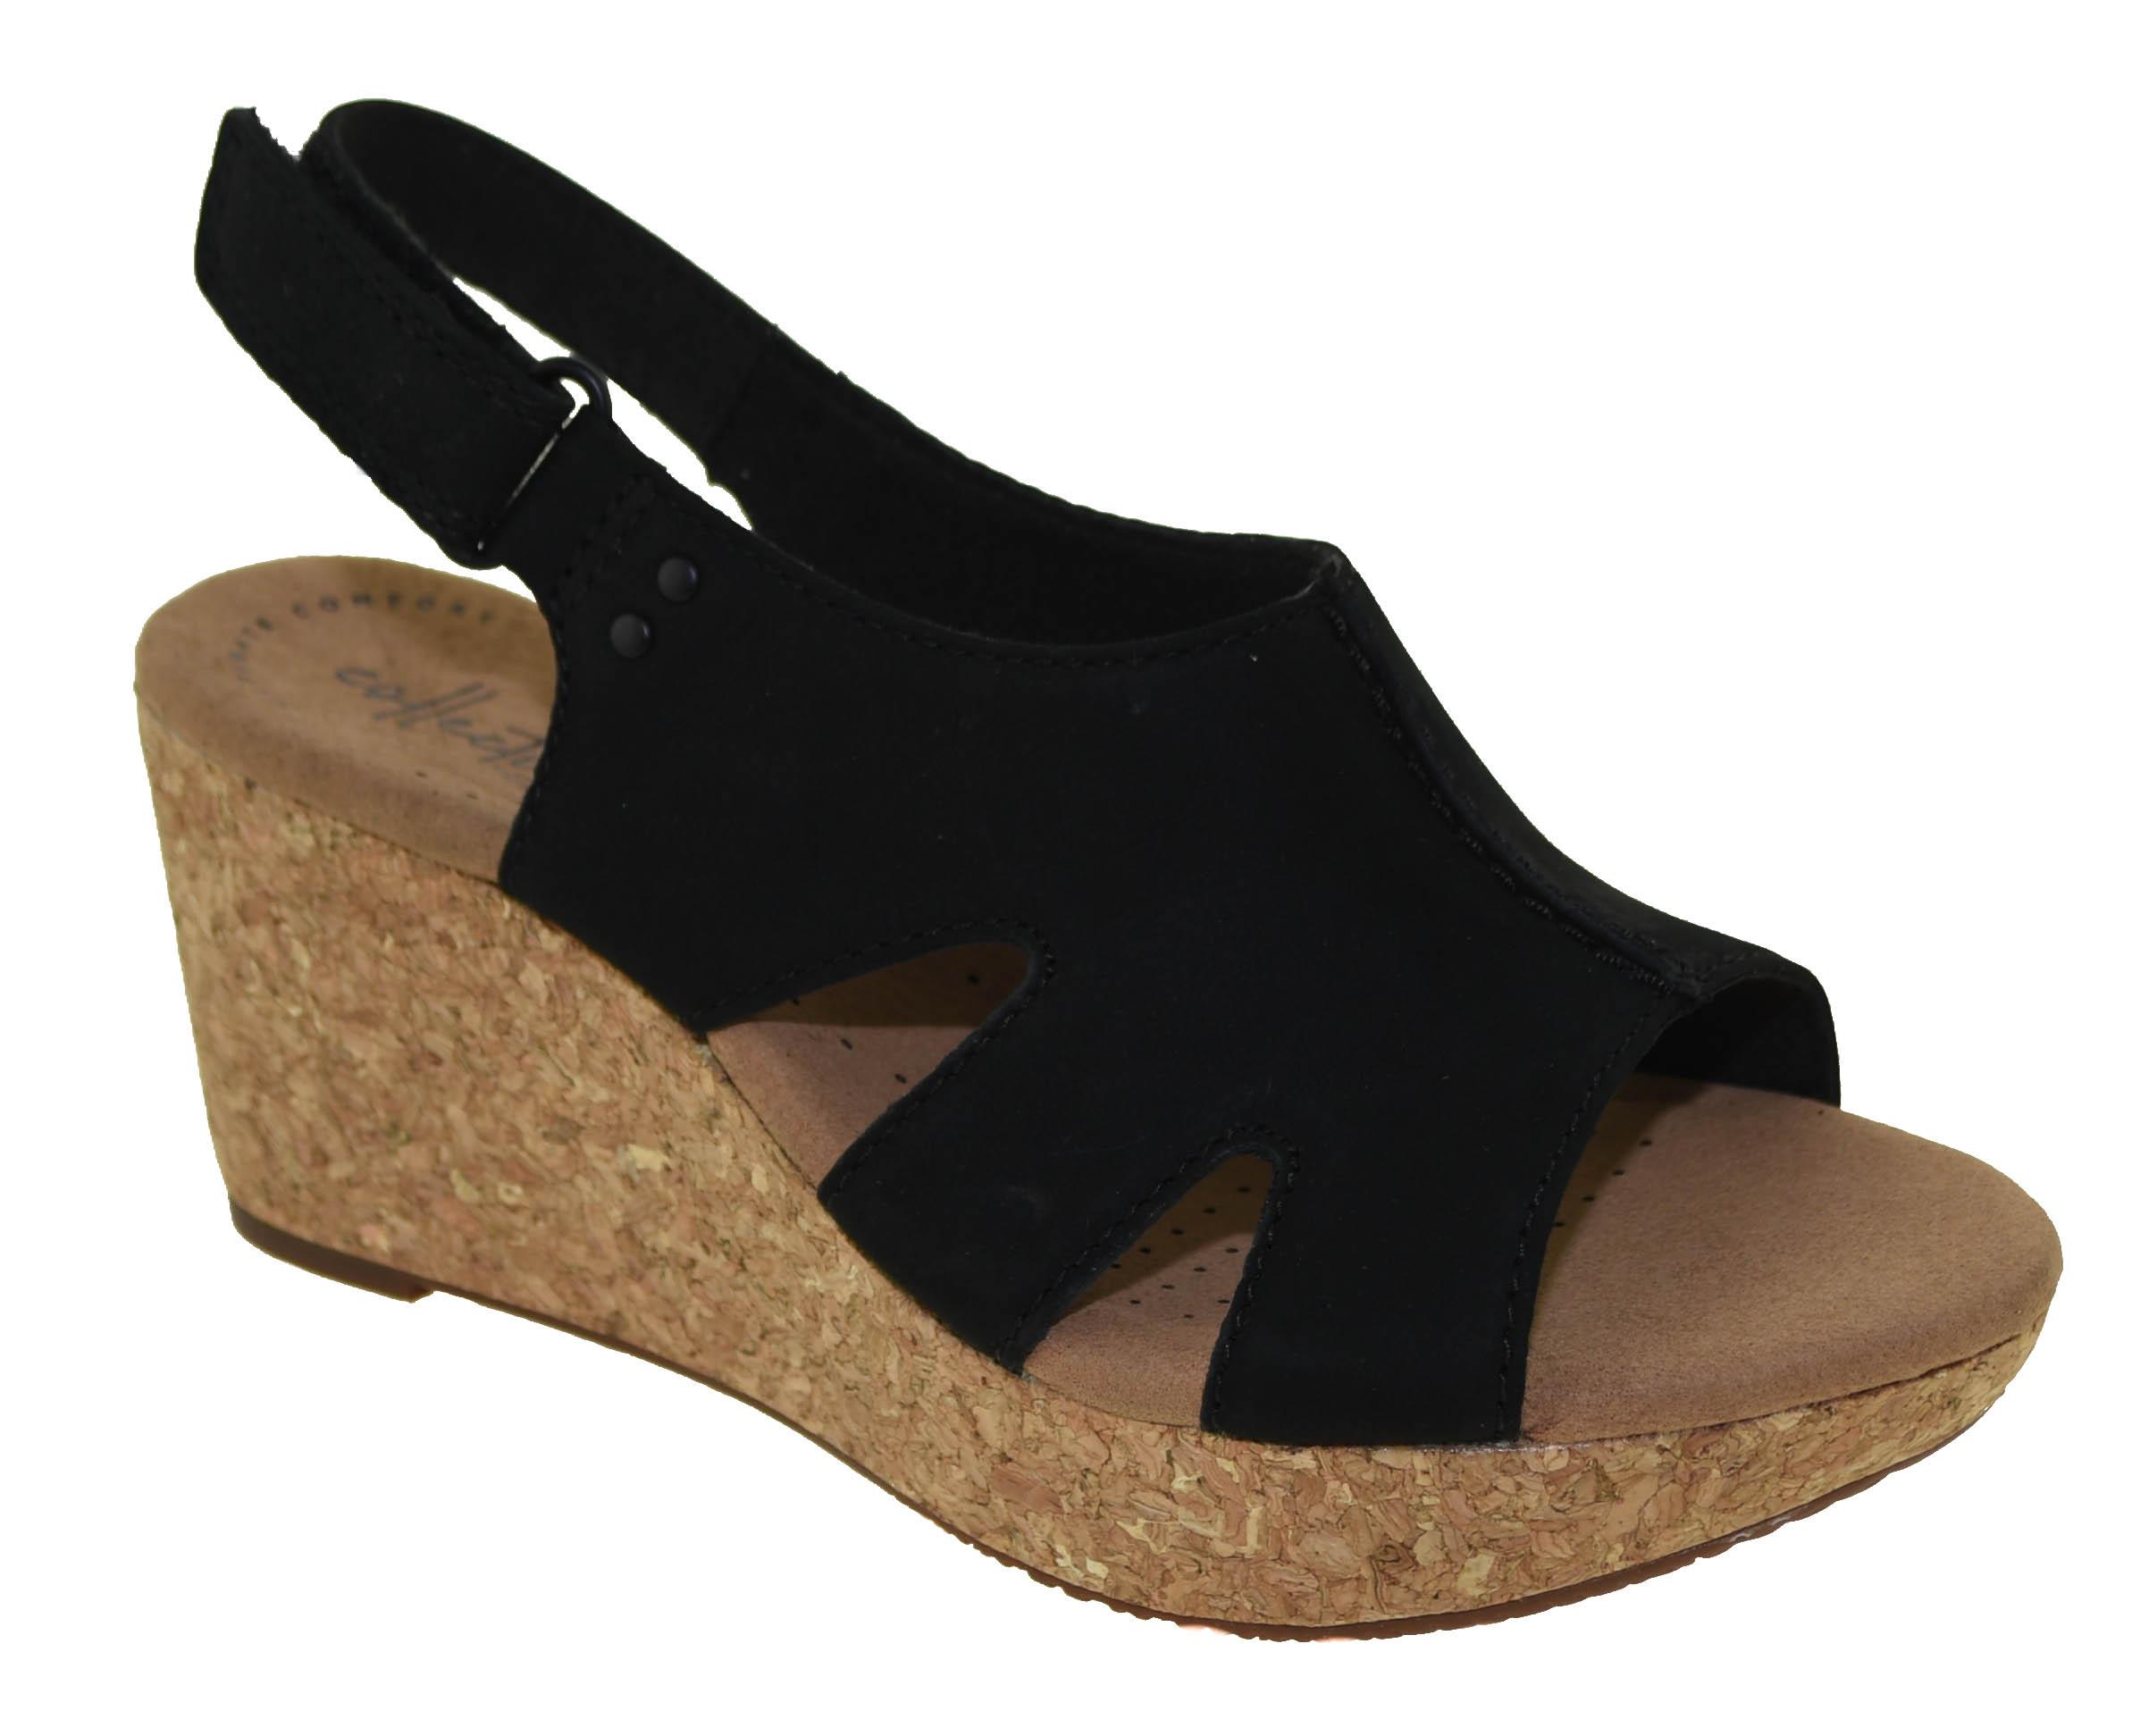 057b123e363 Clarks Women s Annadel Bari Platform Sandal Black Nubuck Style 32948 ...